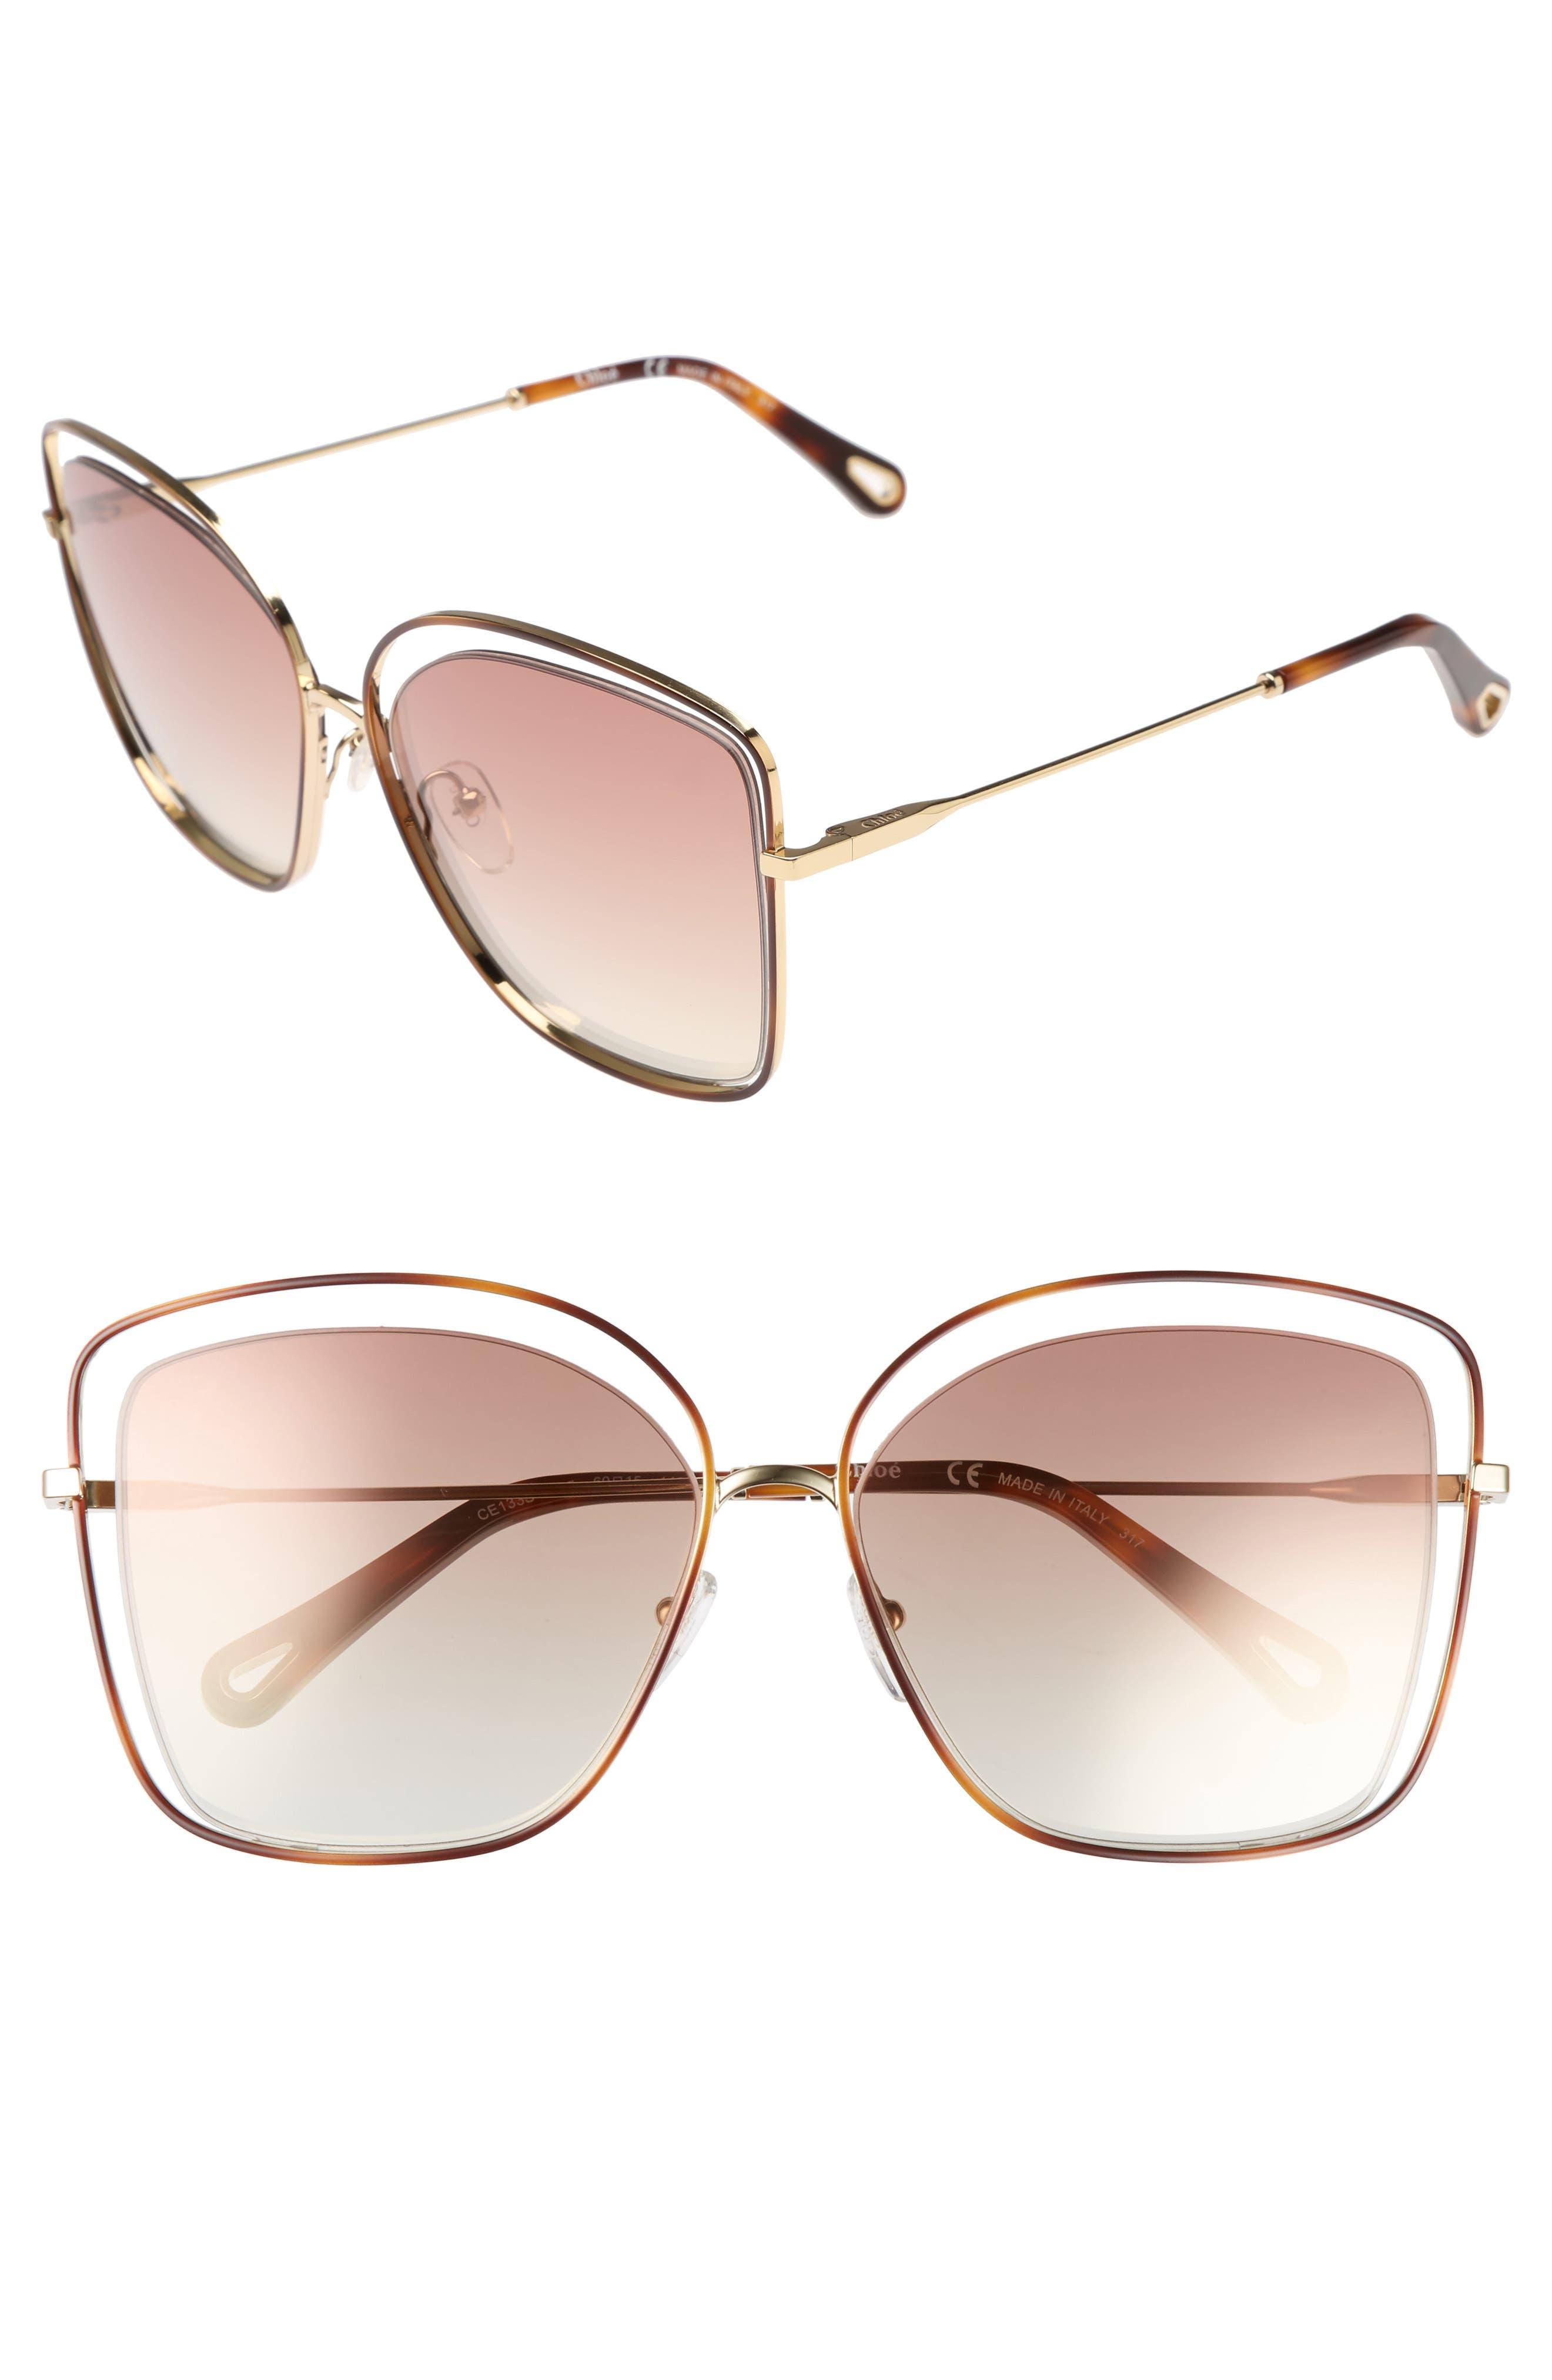 60mm Halo Frame Sunglasses,                             Main thumbnail 1, color,                             HAVANA/ BRONZE